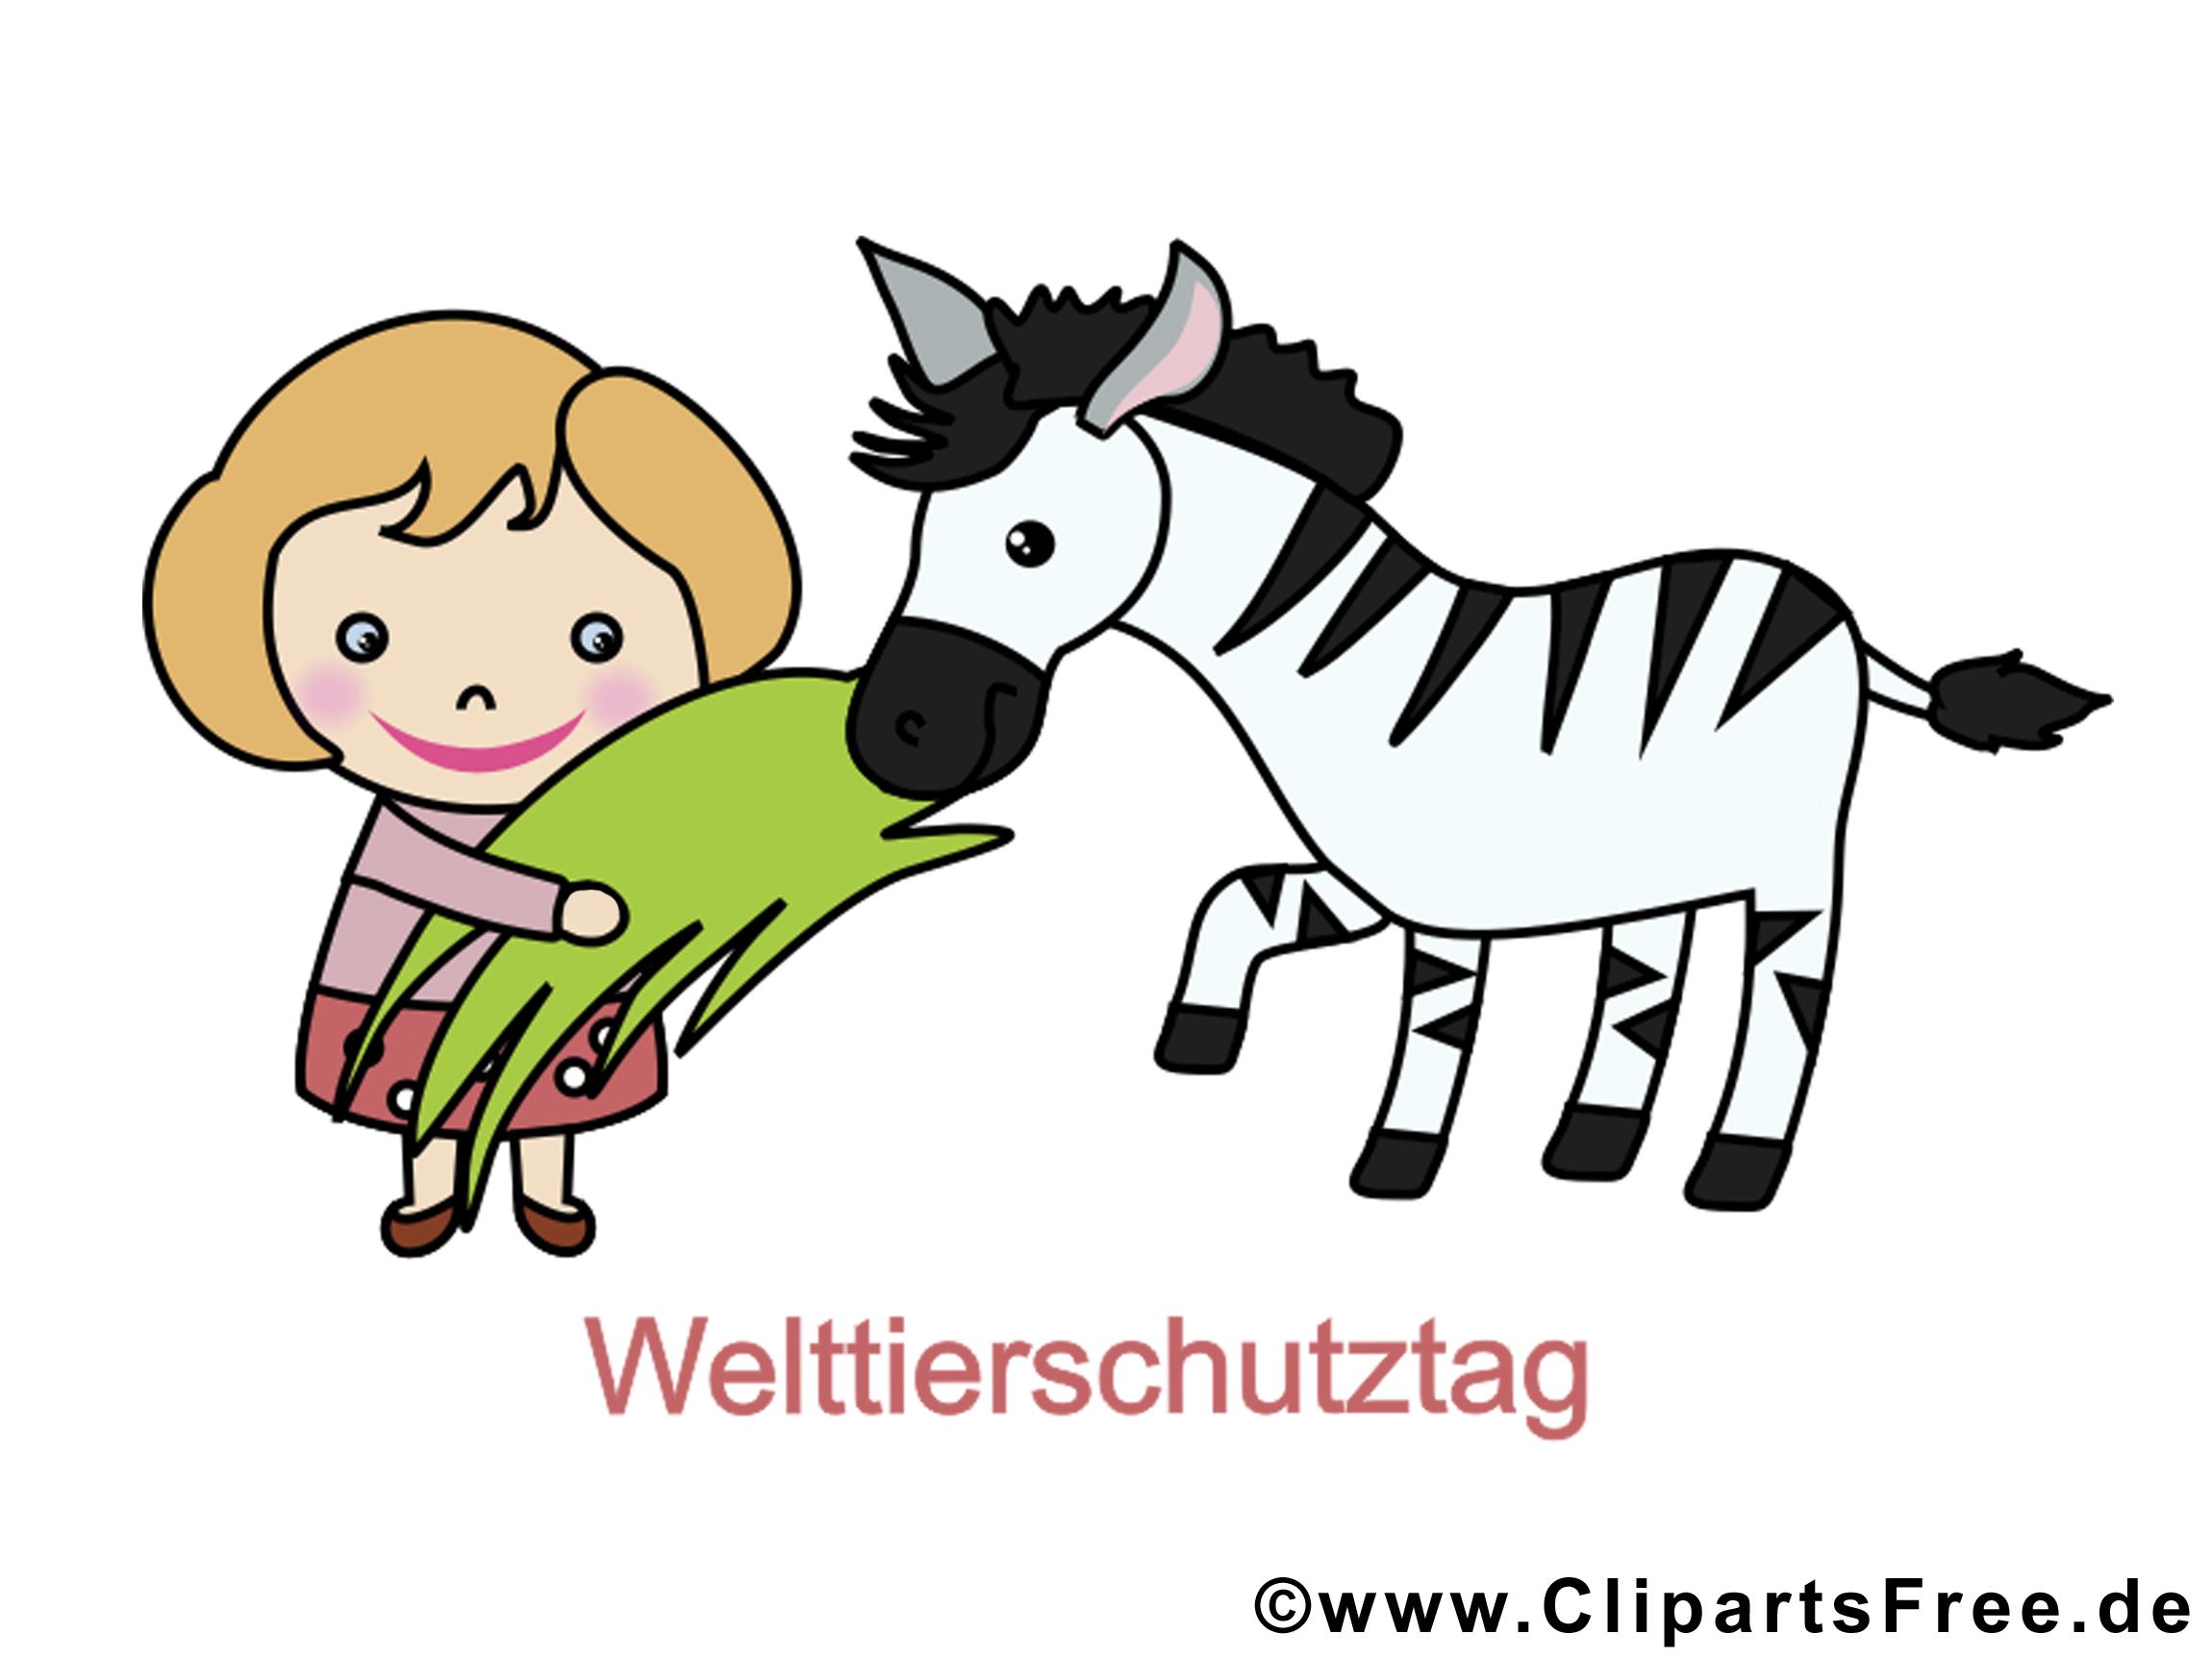 Welttierschutztag Bild, Clipart, Image, Cartoon